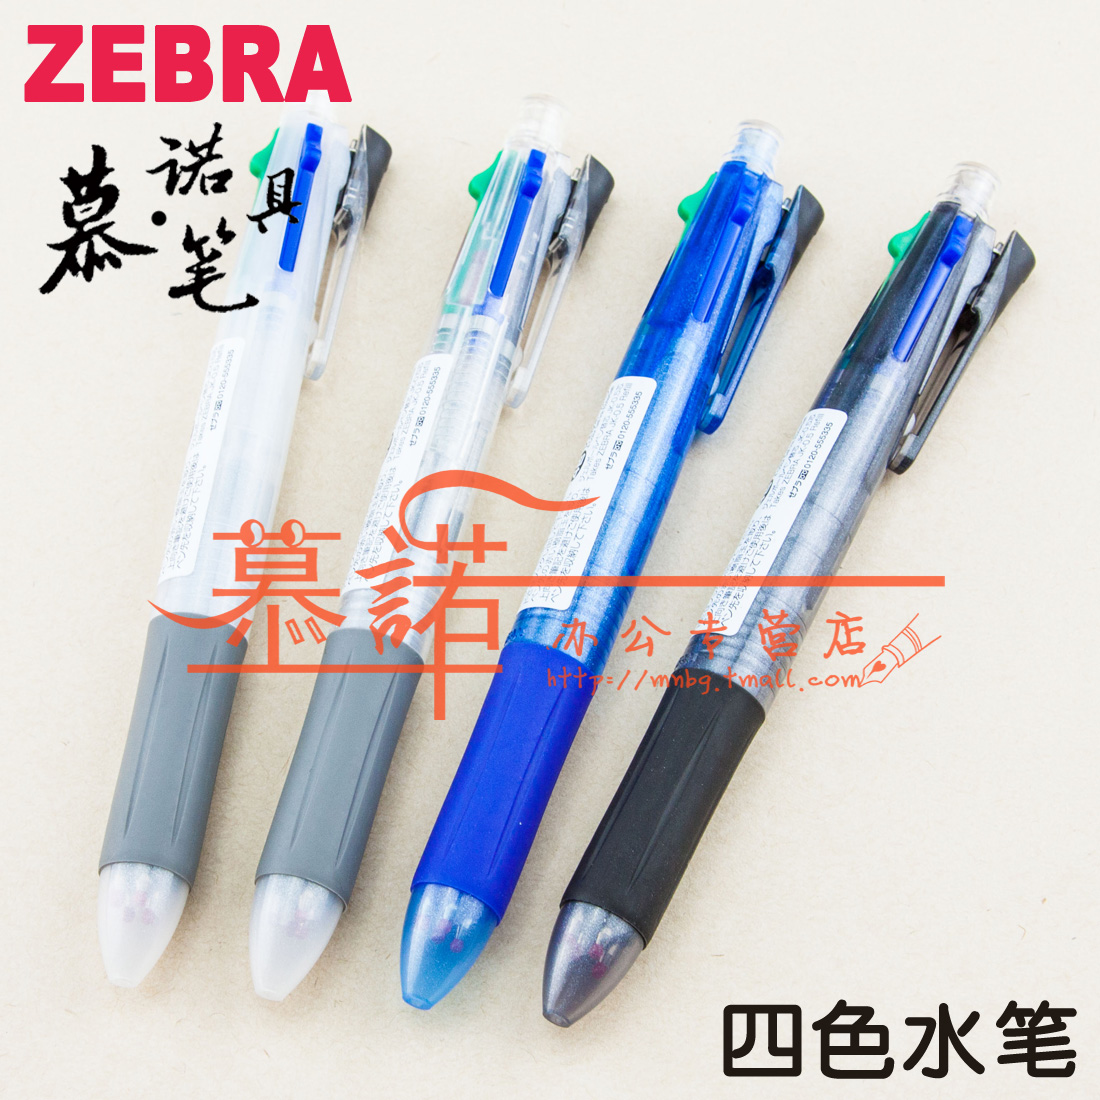 Ручка ZEBRA  J4J1 ручка гелевая zebra sarasa clip jj15 vir авт 0 5мм темно зеленый